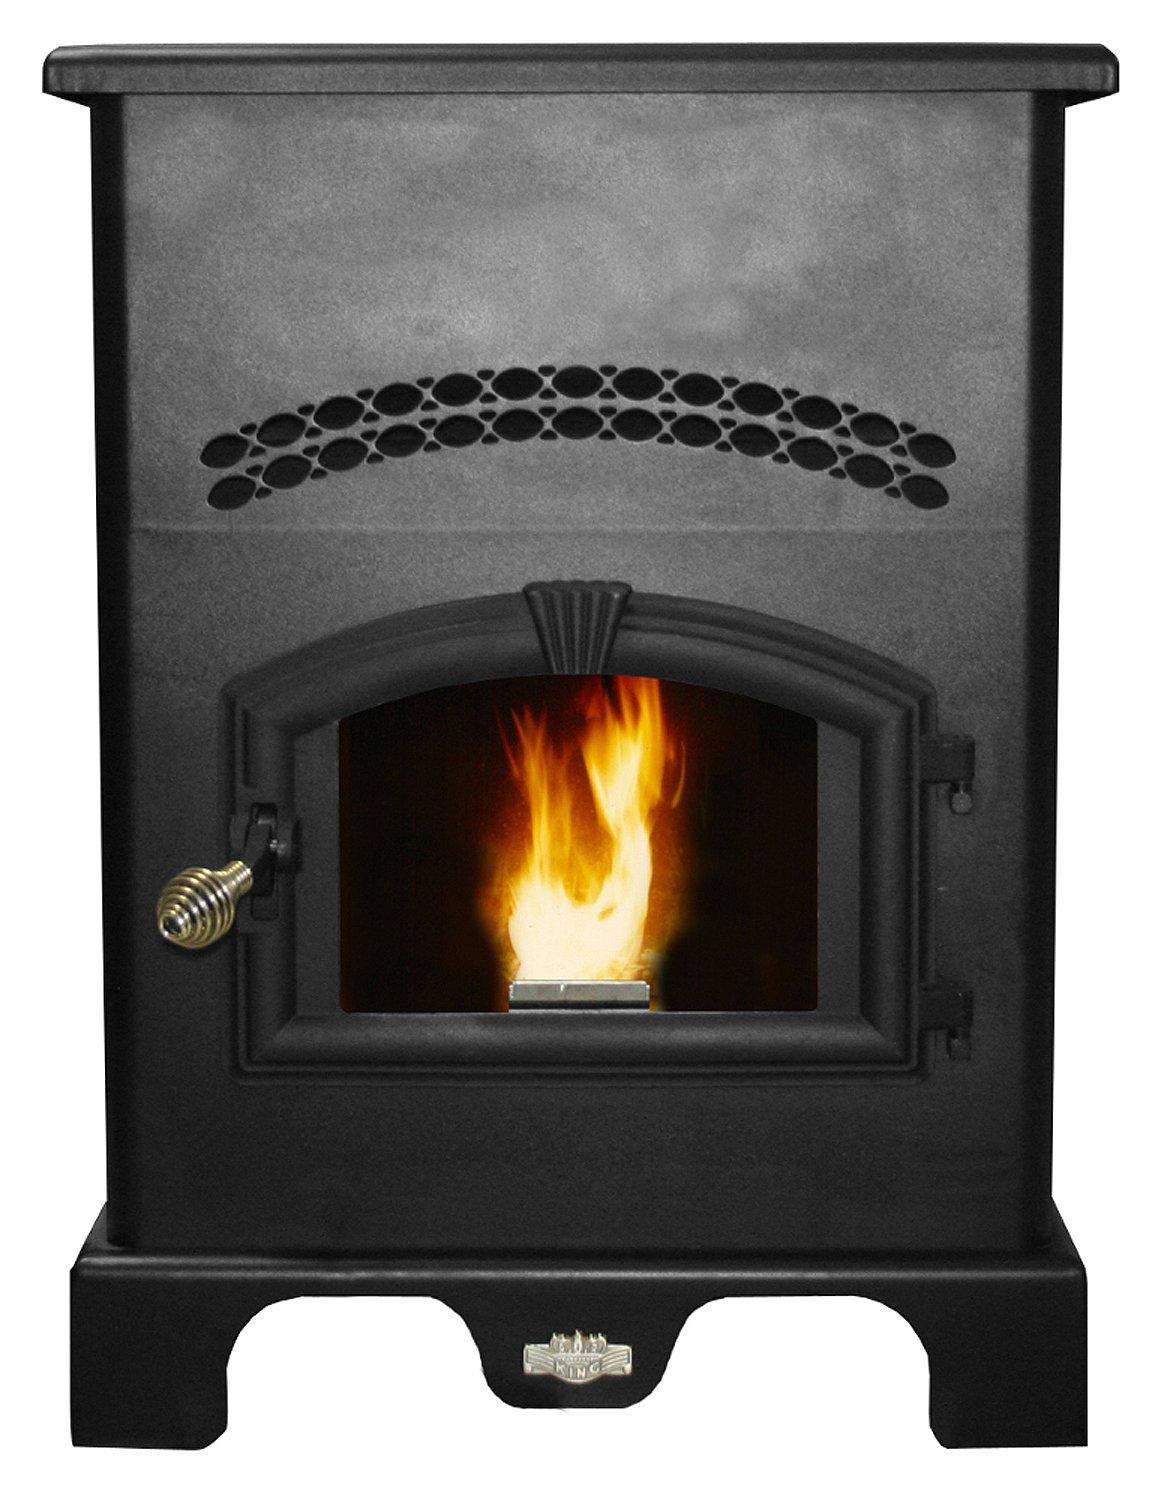 Amazon.com: US Stove 5500M King Pellet Burner with Igniter: Home ...